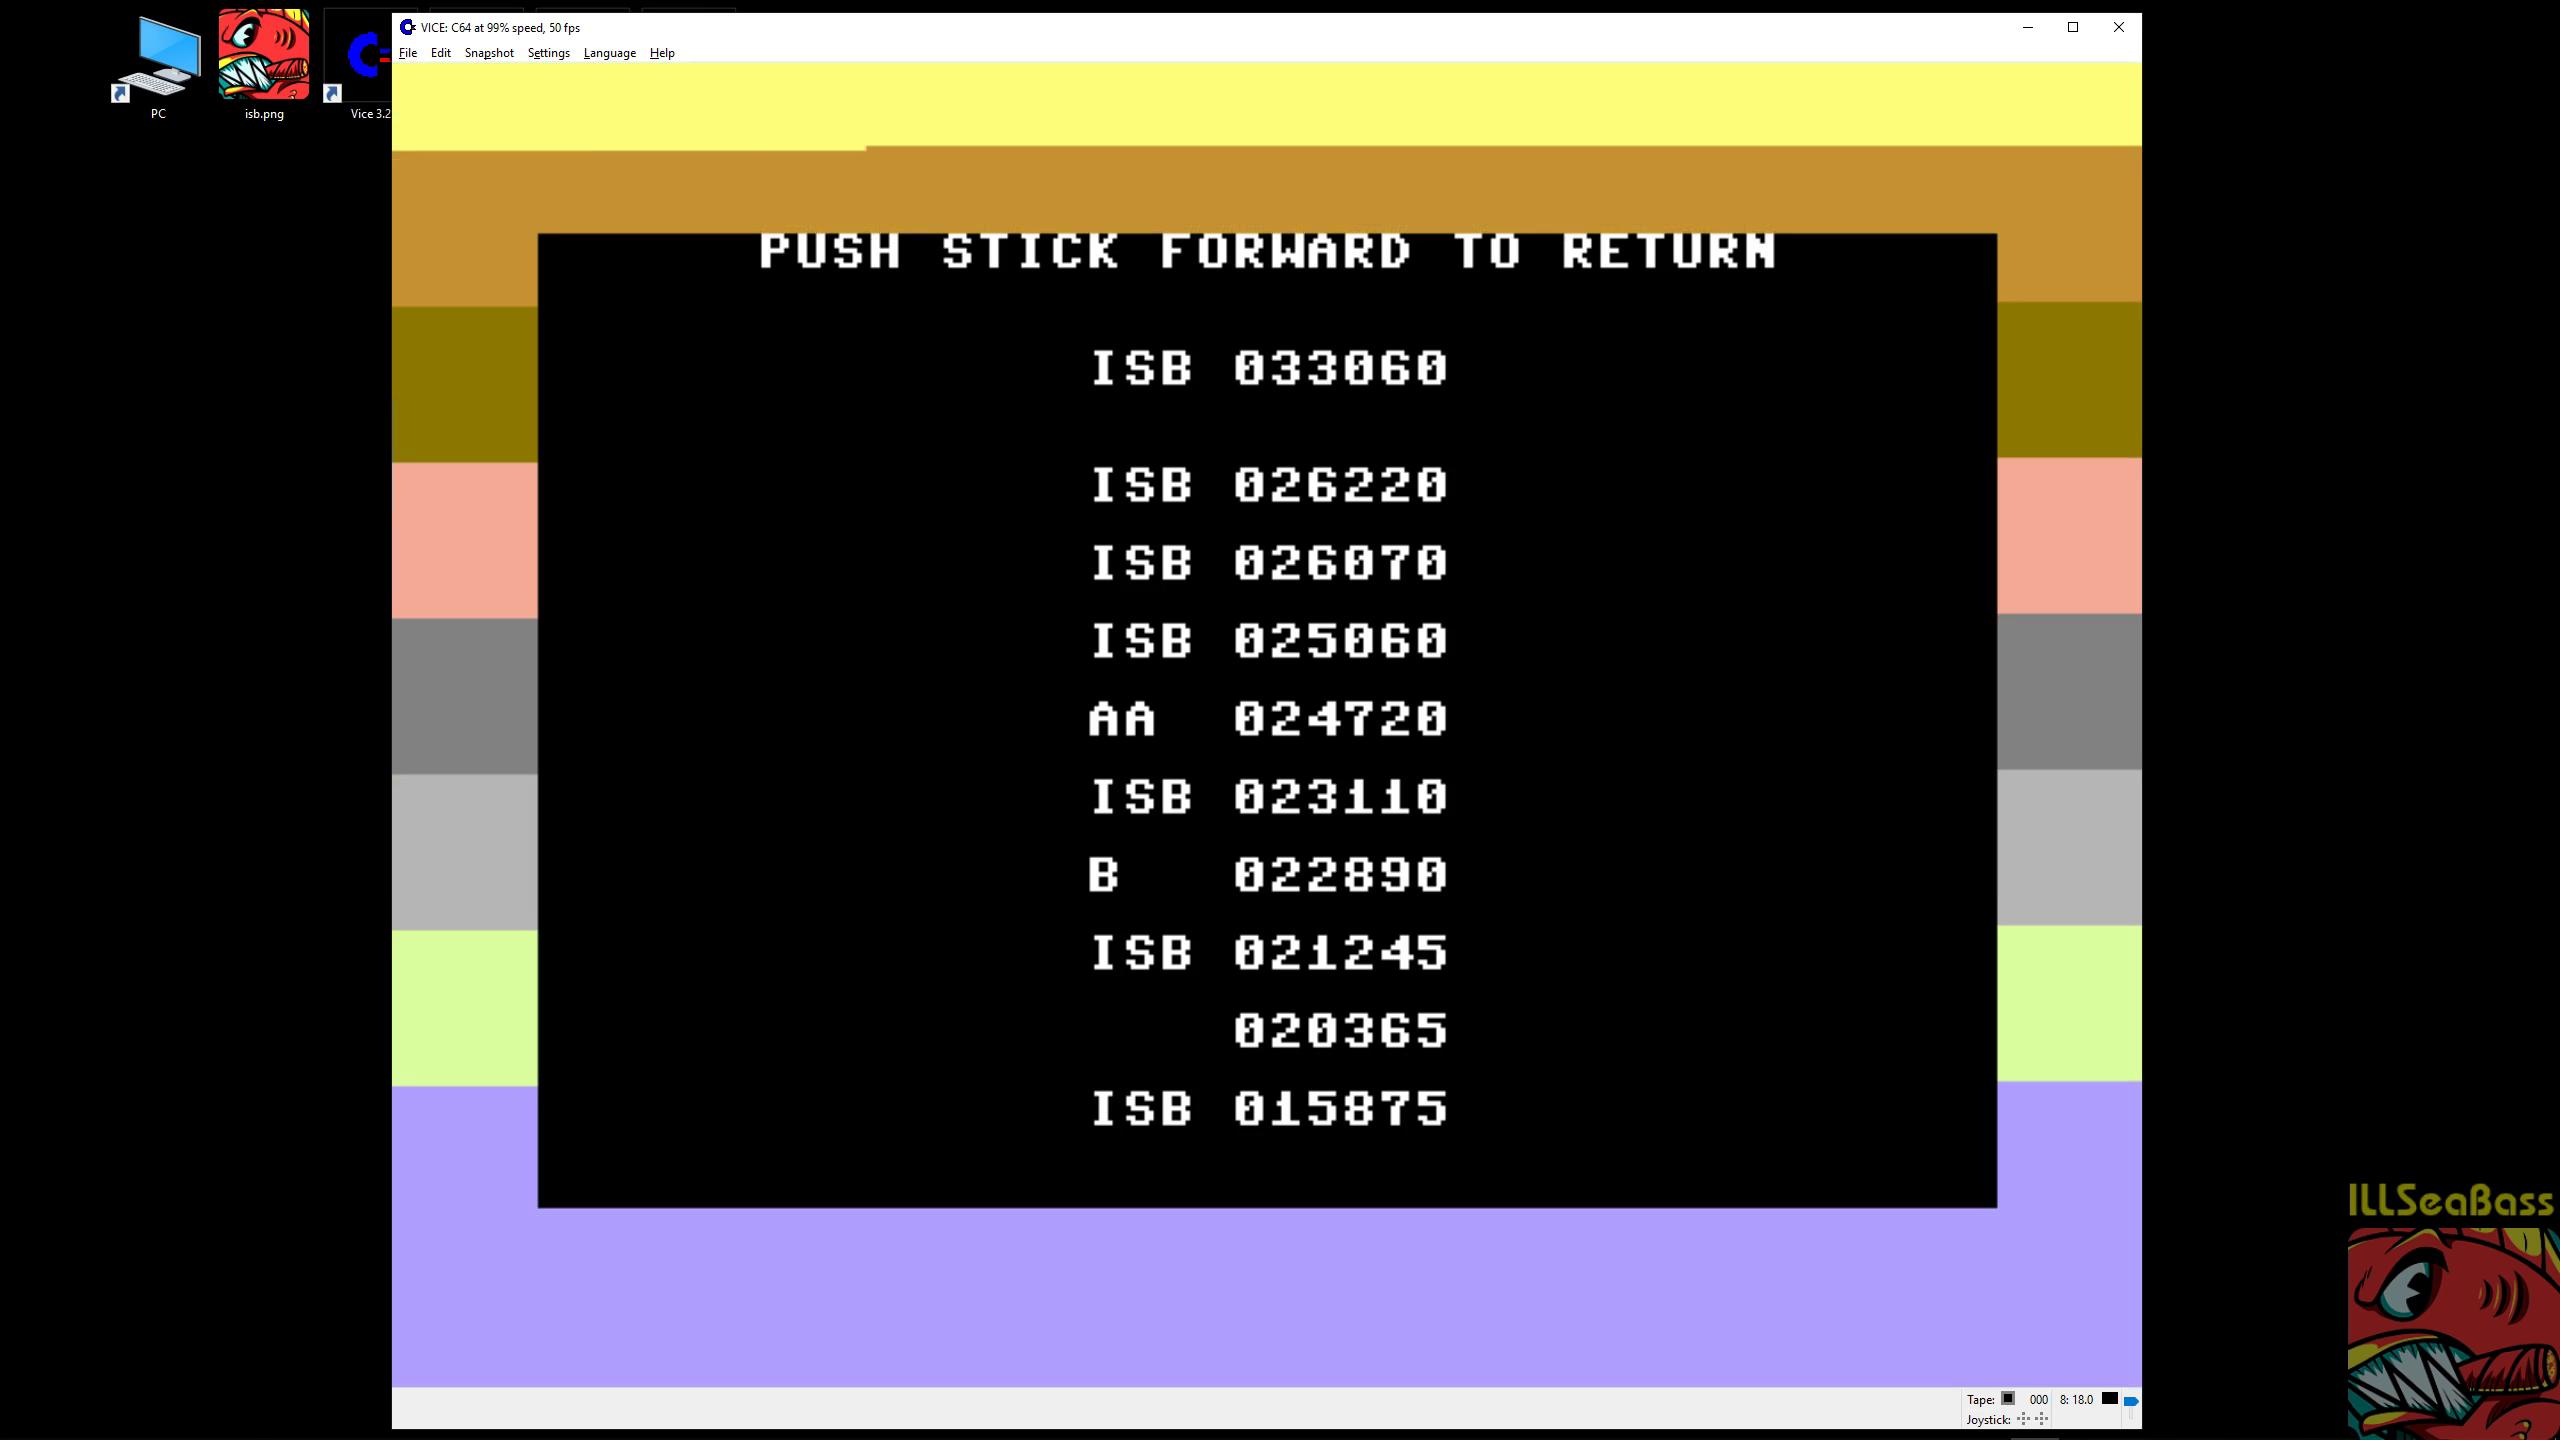 ILLSeaBass: Ardy The Aardvark [1983] (Commodore 64 Emulated) 33,060 points on 2019-02-24 12:25:21